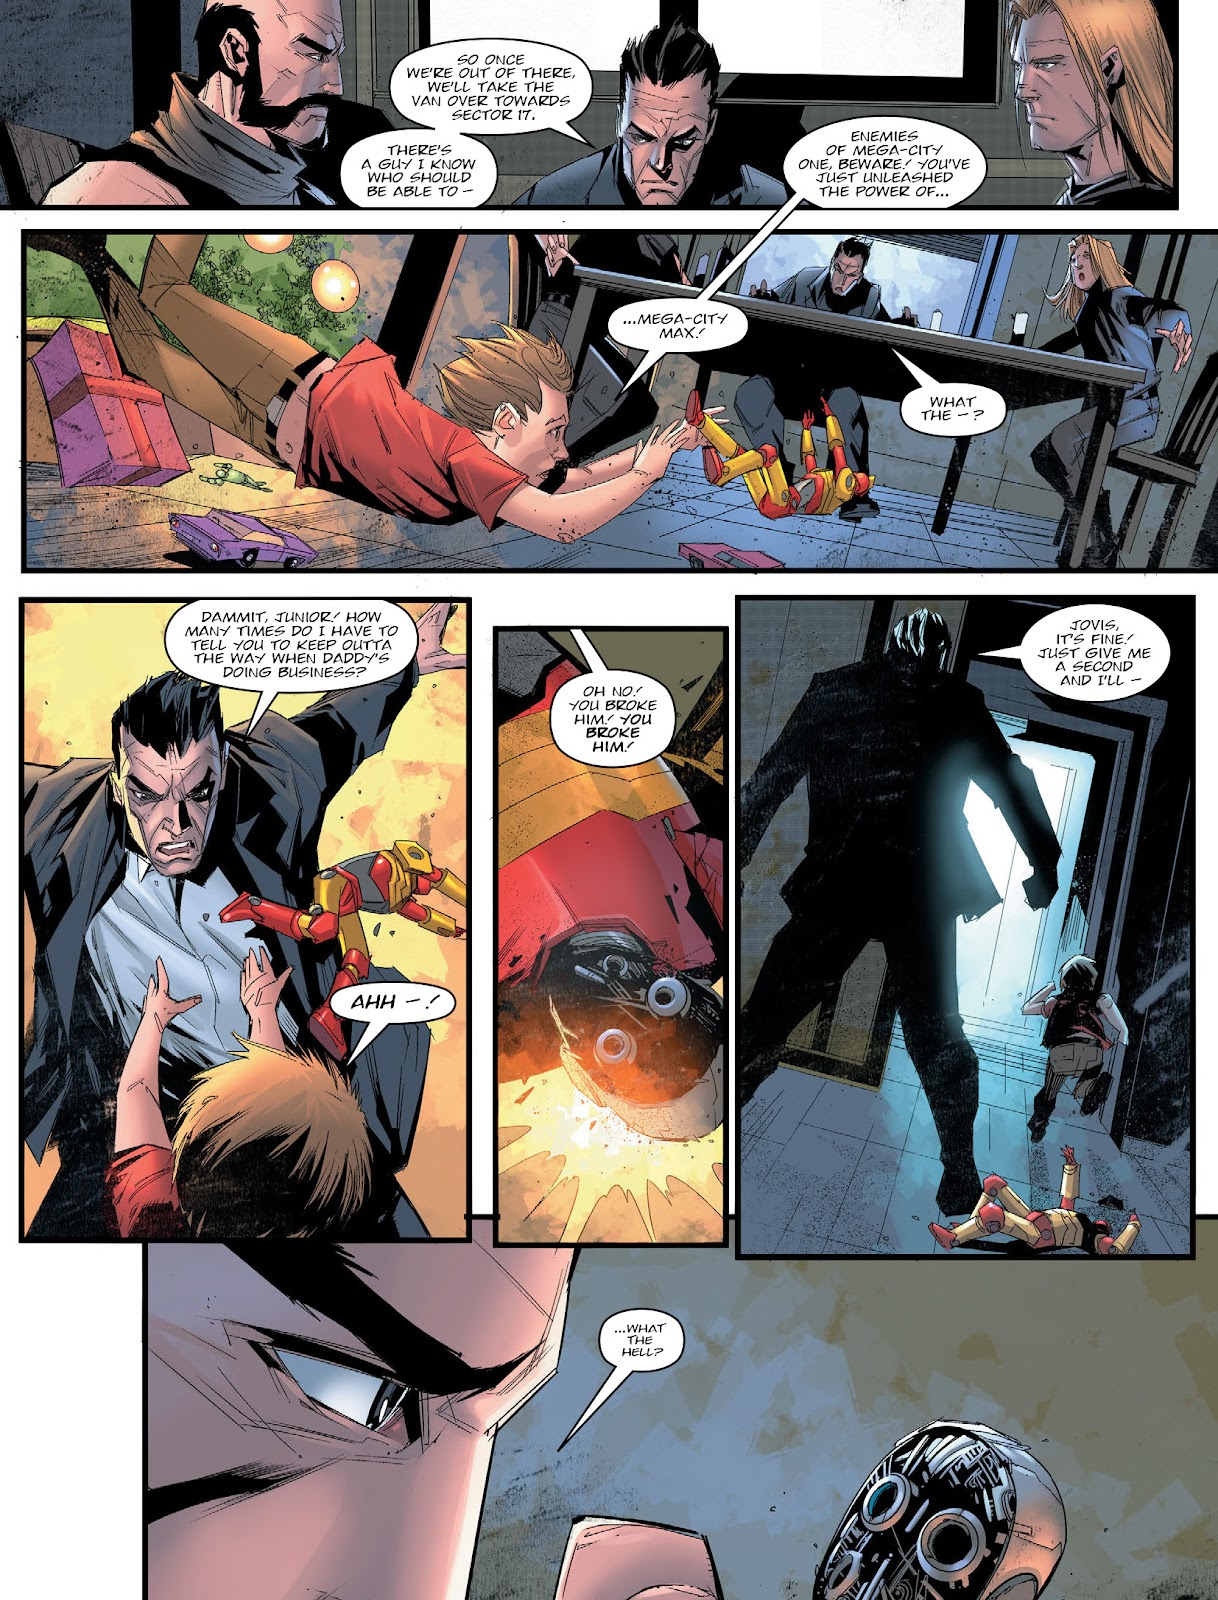 Judge Dredd Megazine (Vol. 5) issue 427 - Page 11